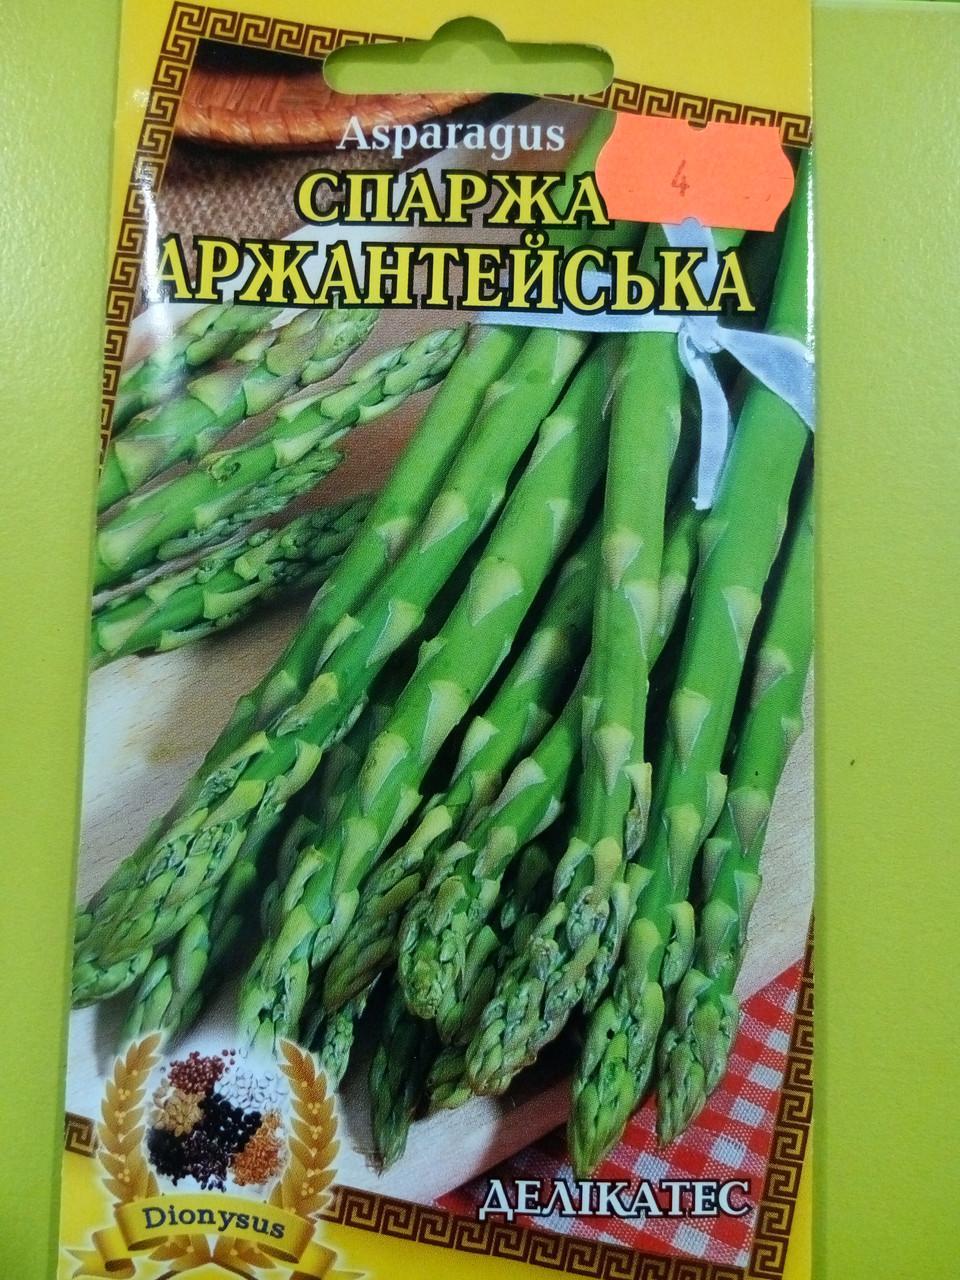 Семена спаржи сорт Аржантейская 0.5 гр